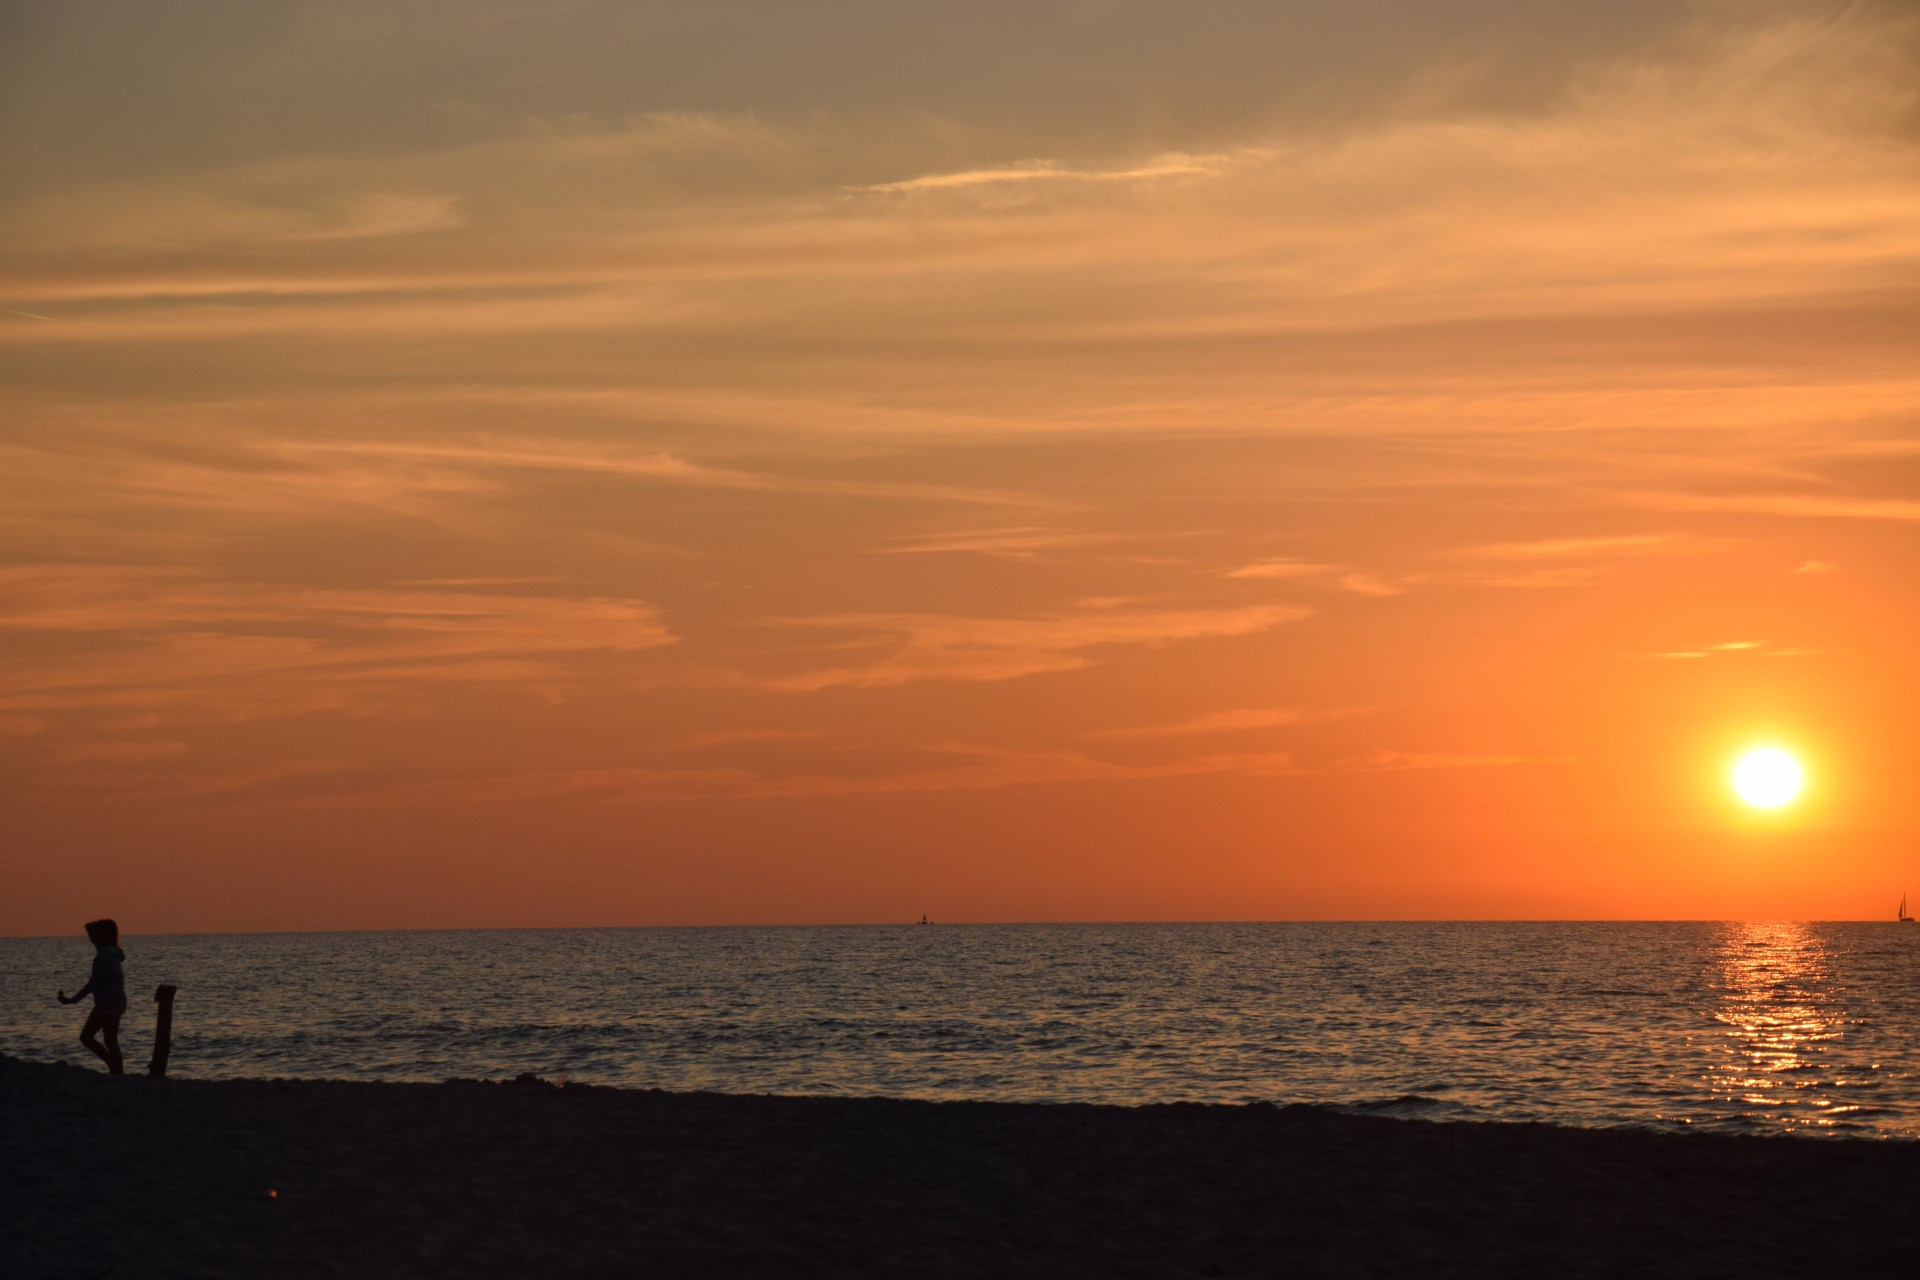 Kopalino, plaża. Nieopowiedziane historie [FOTOREPORTAŻ] 8